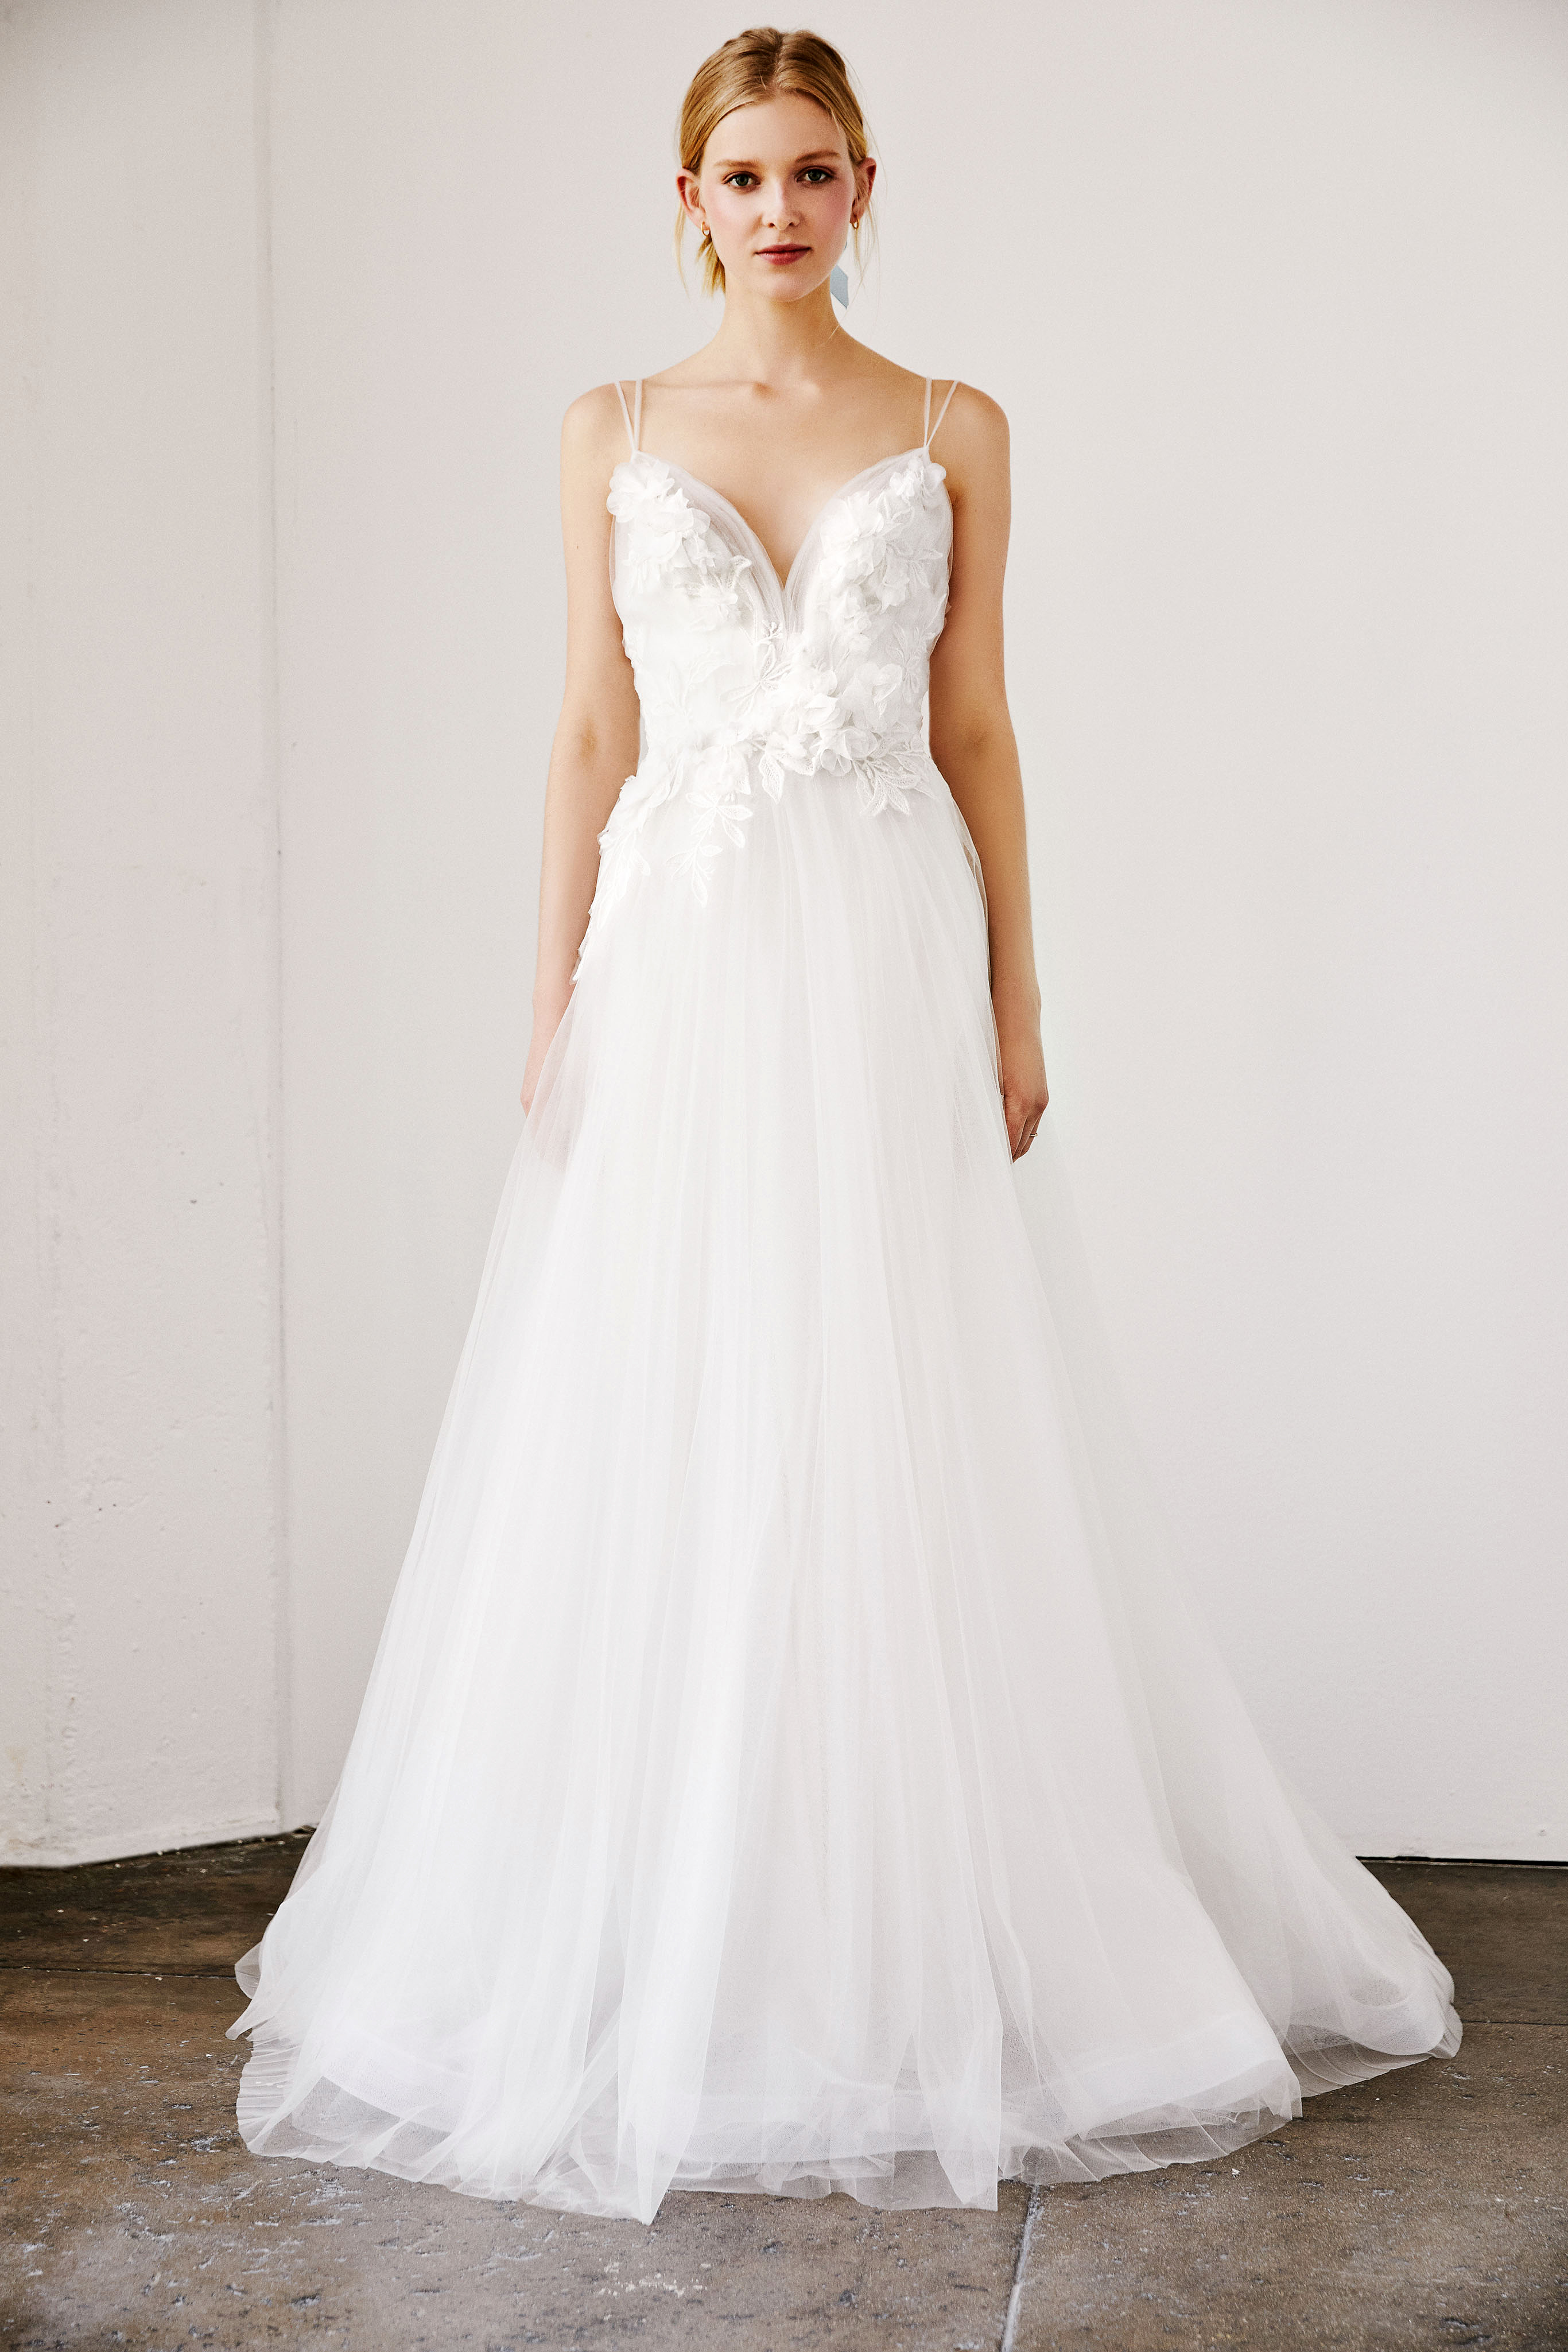 tadashi shoji wedding dress spring 2019 floral applique spaghetti strap